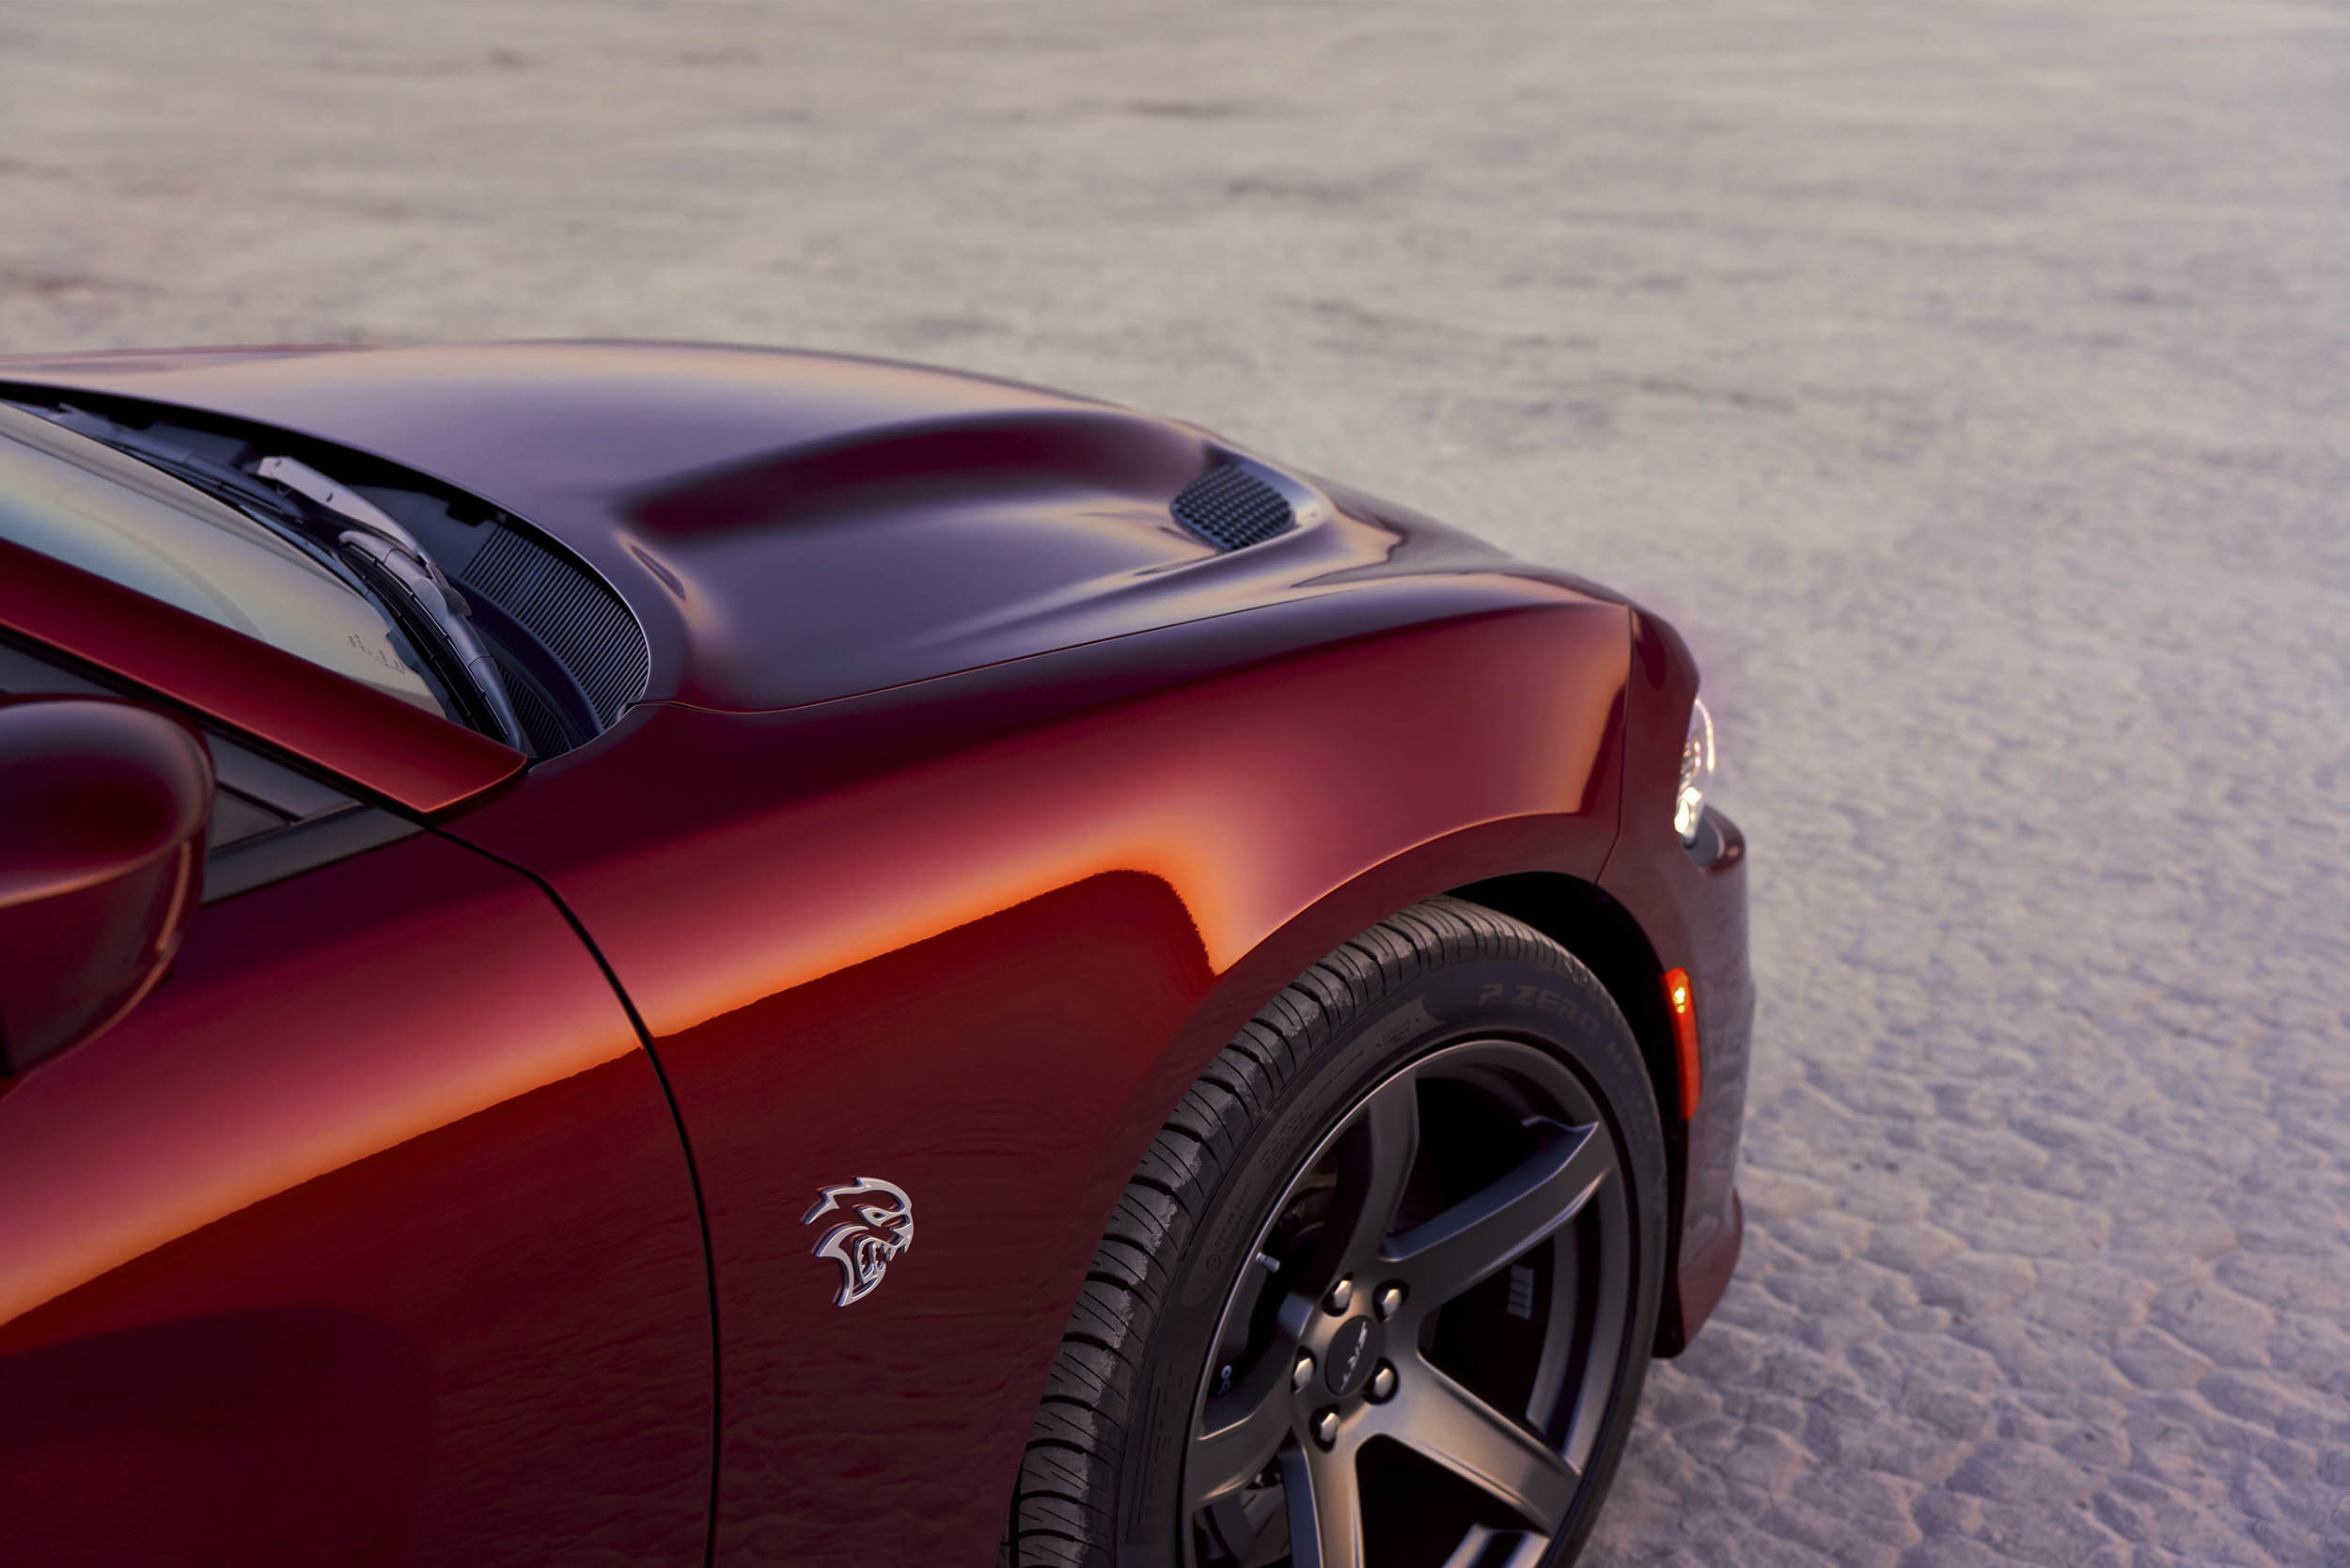 2019 Dodge Charger SRT Hellcat front close-up